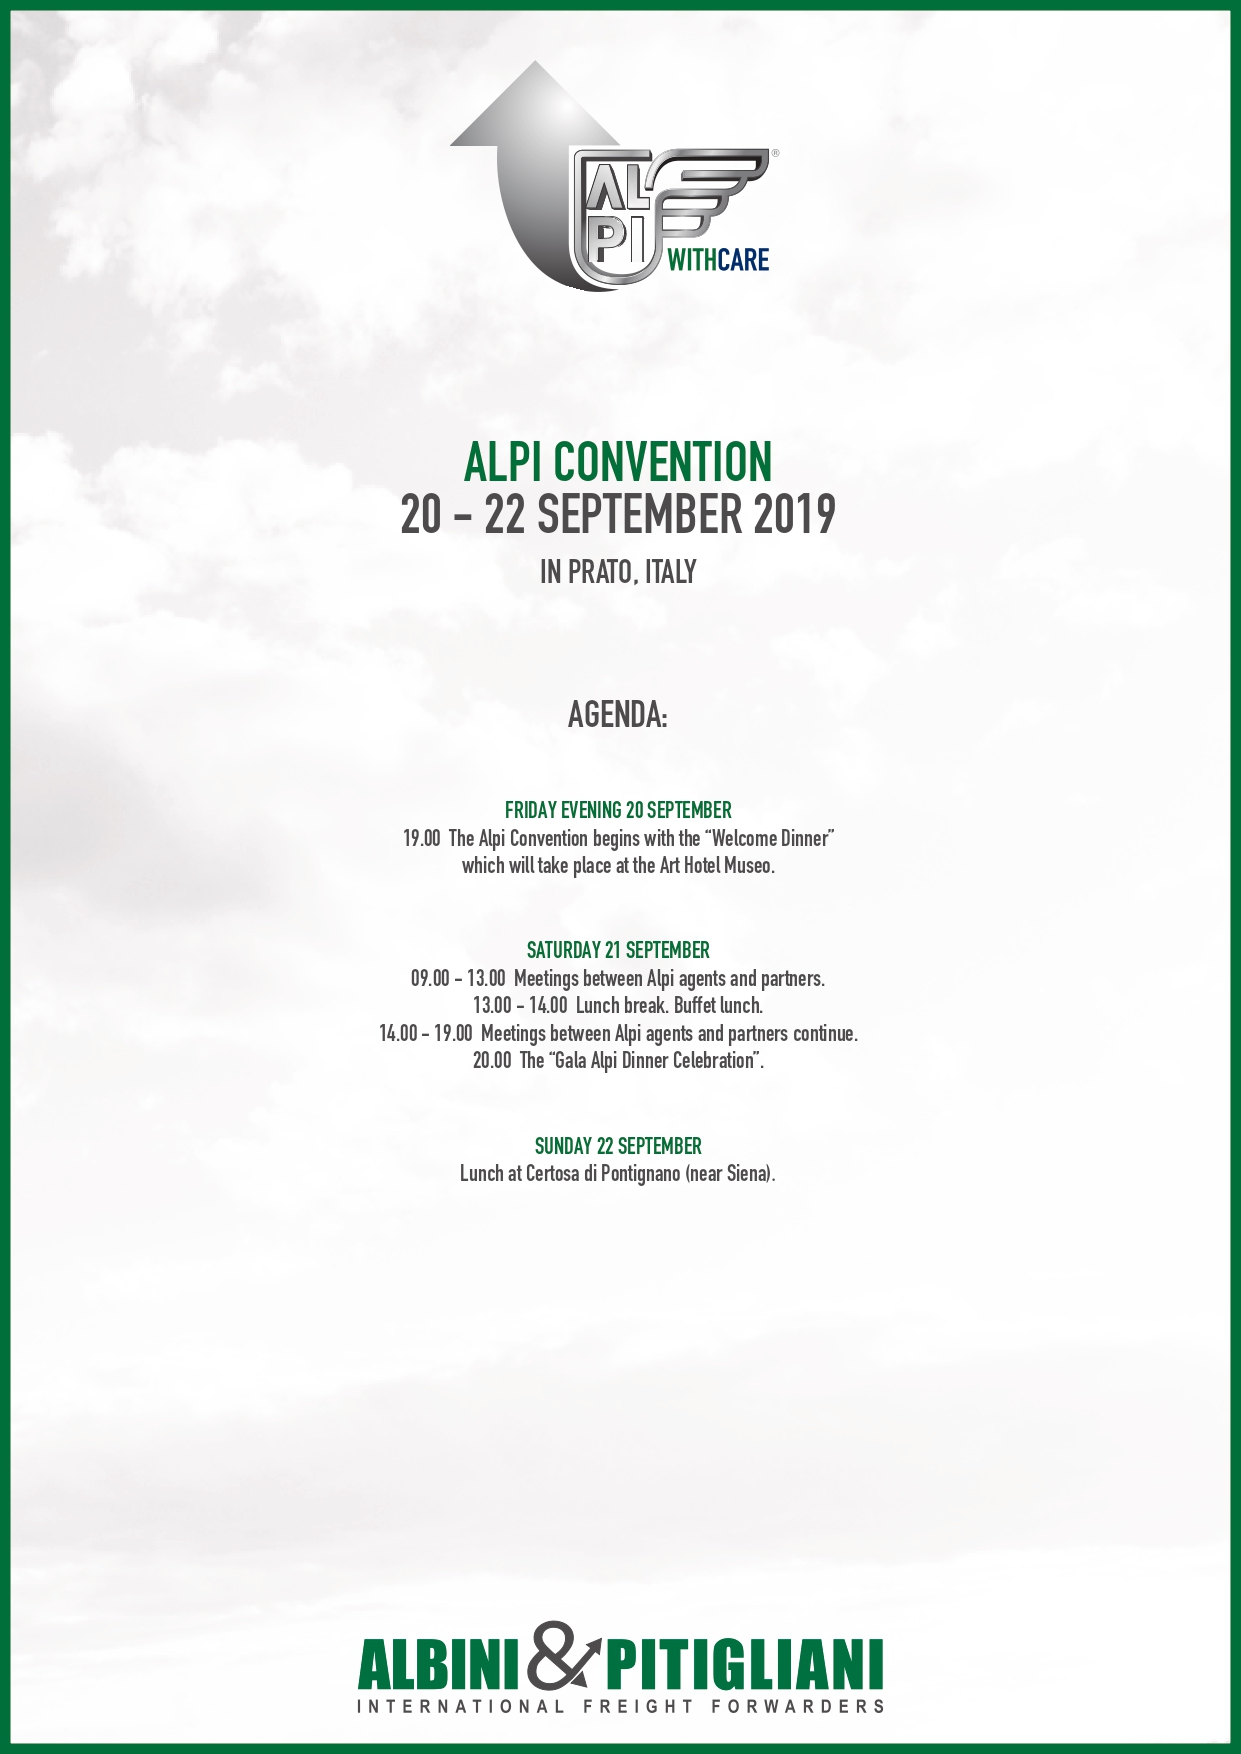 Agenda ALPI Convention 2019